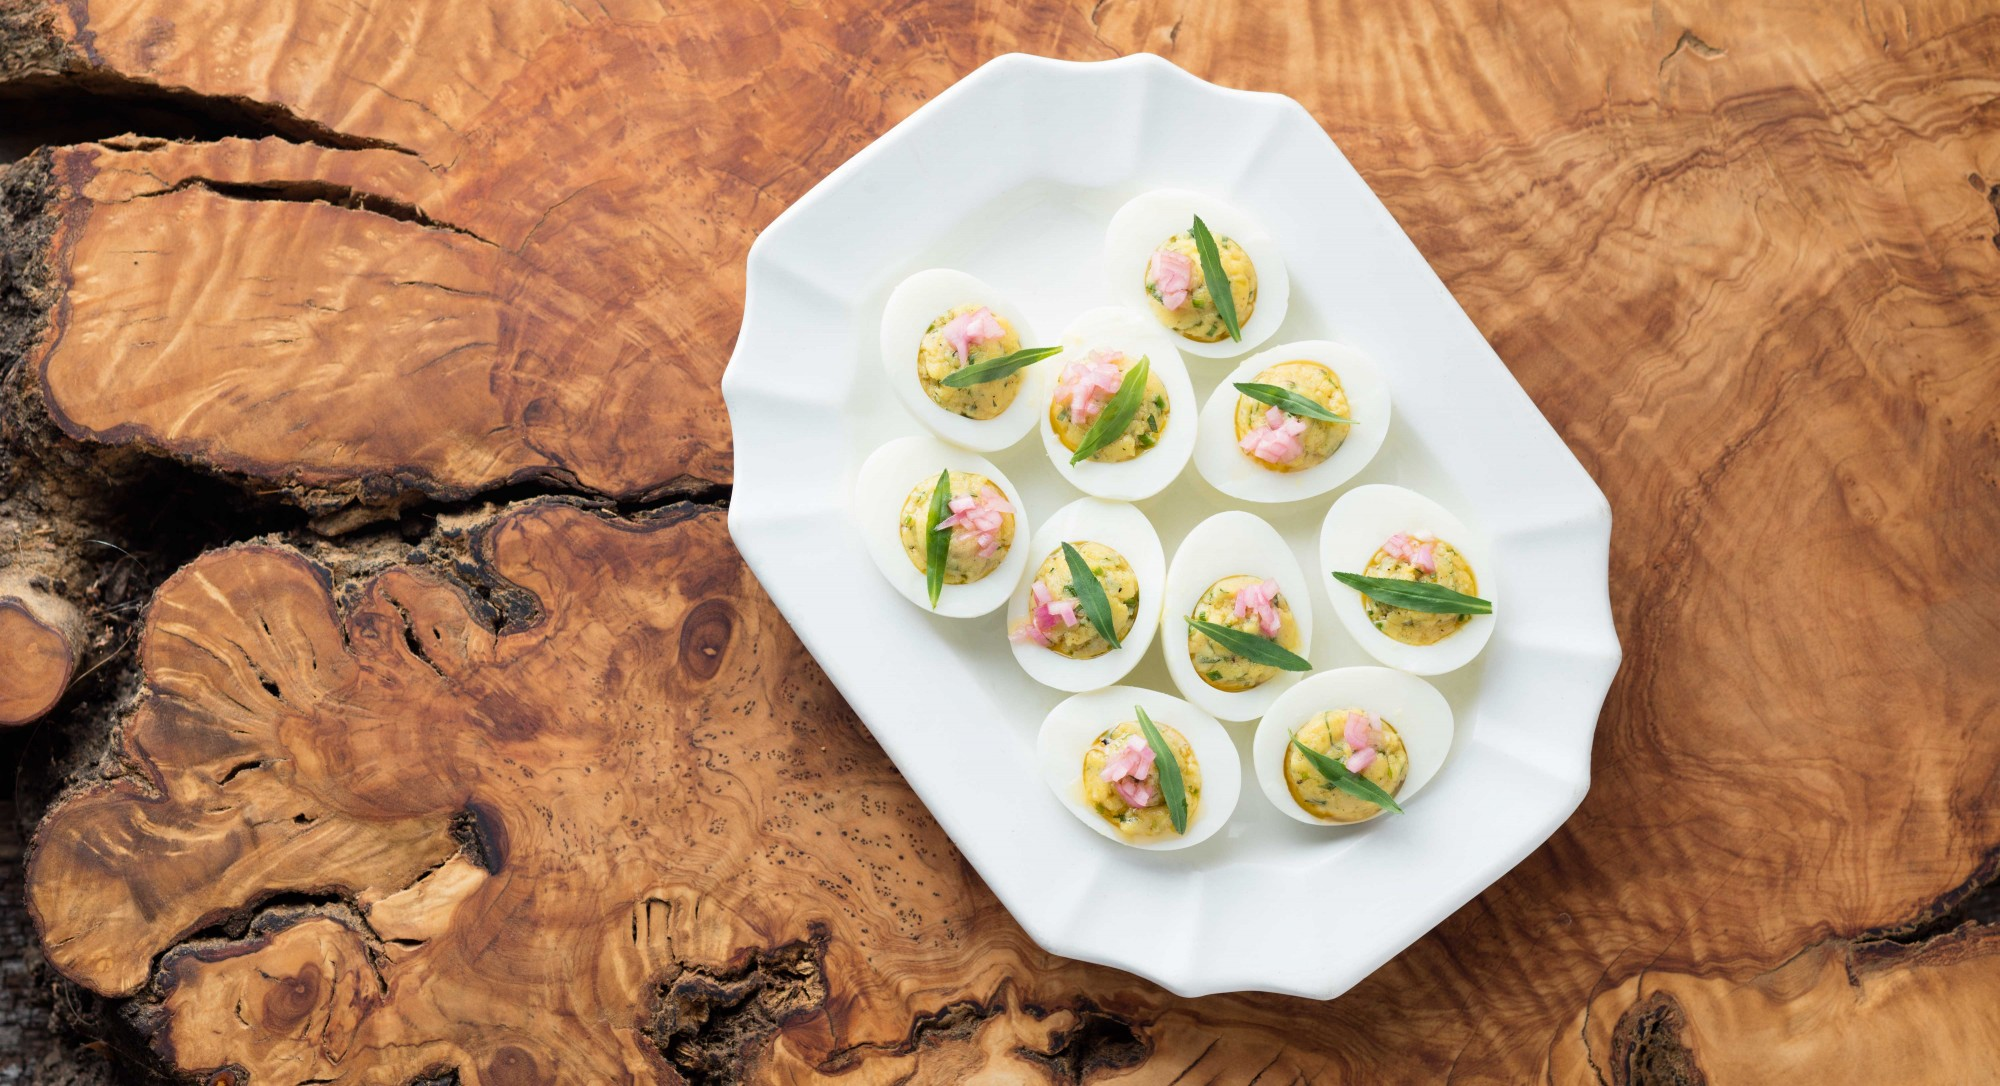 For an Elegant Appetizer, Make Deviled Eggs With Fresh Herbs